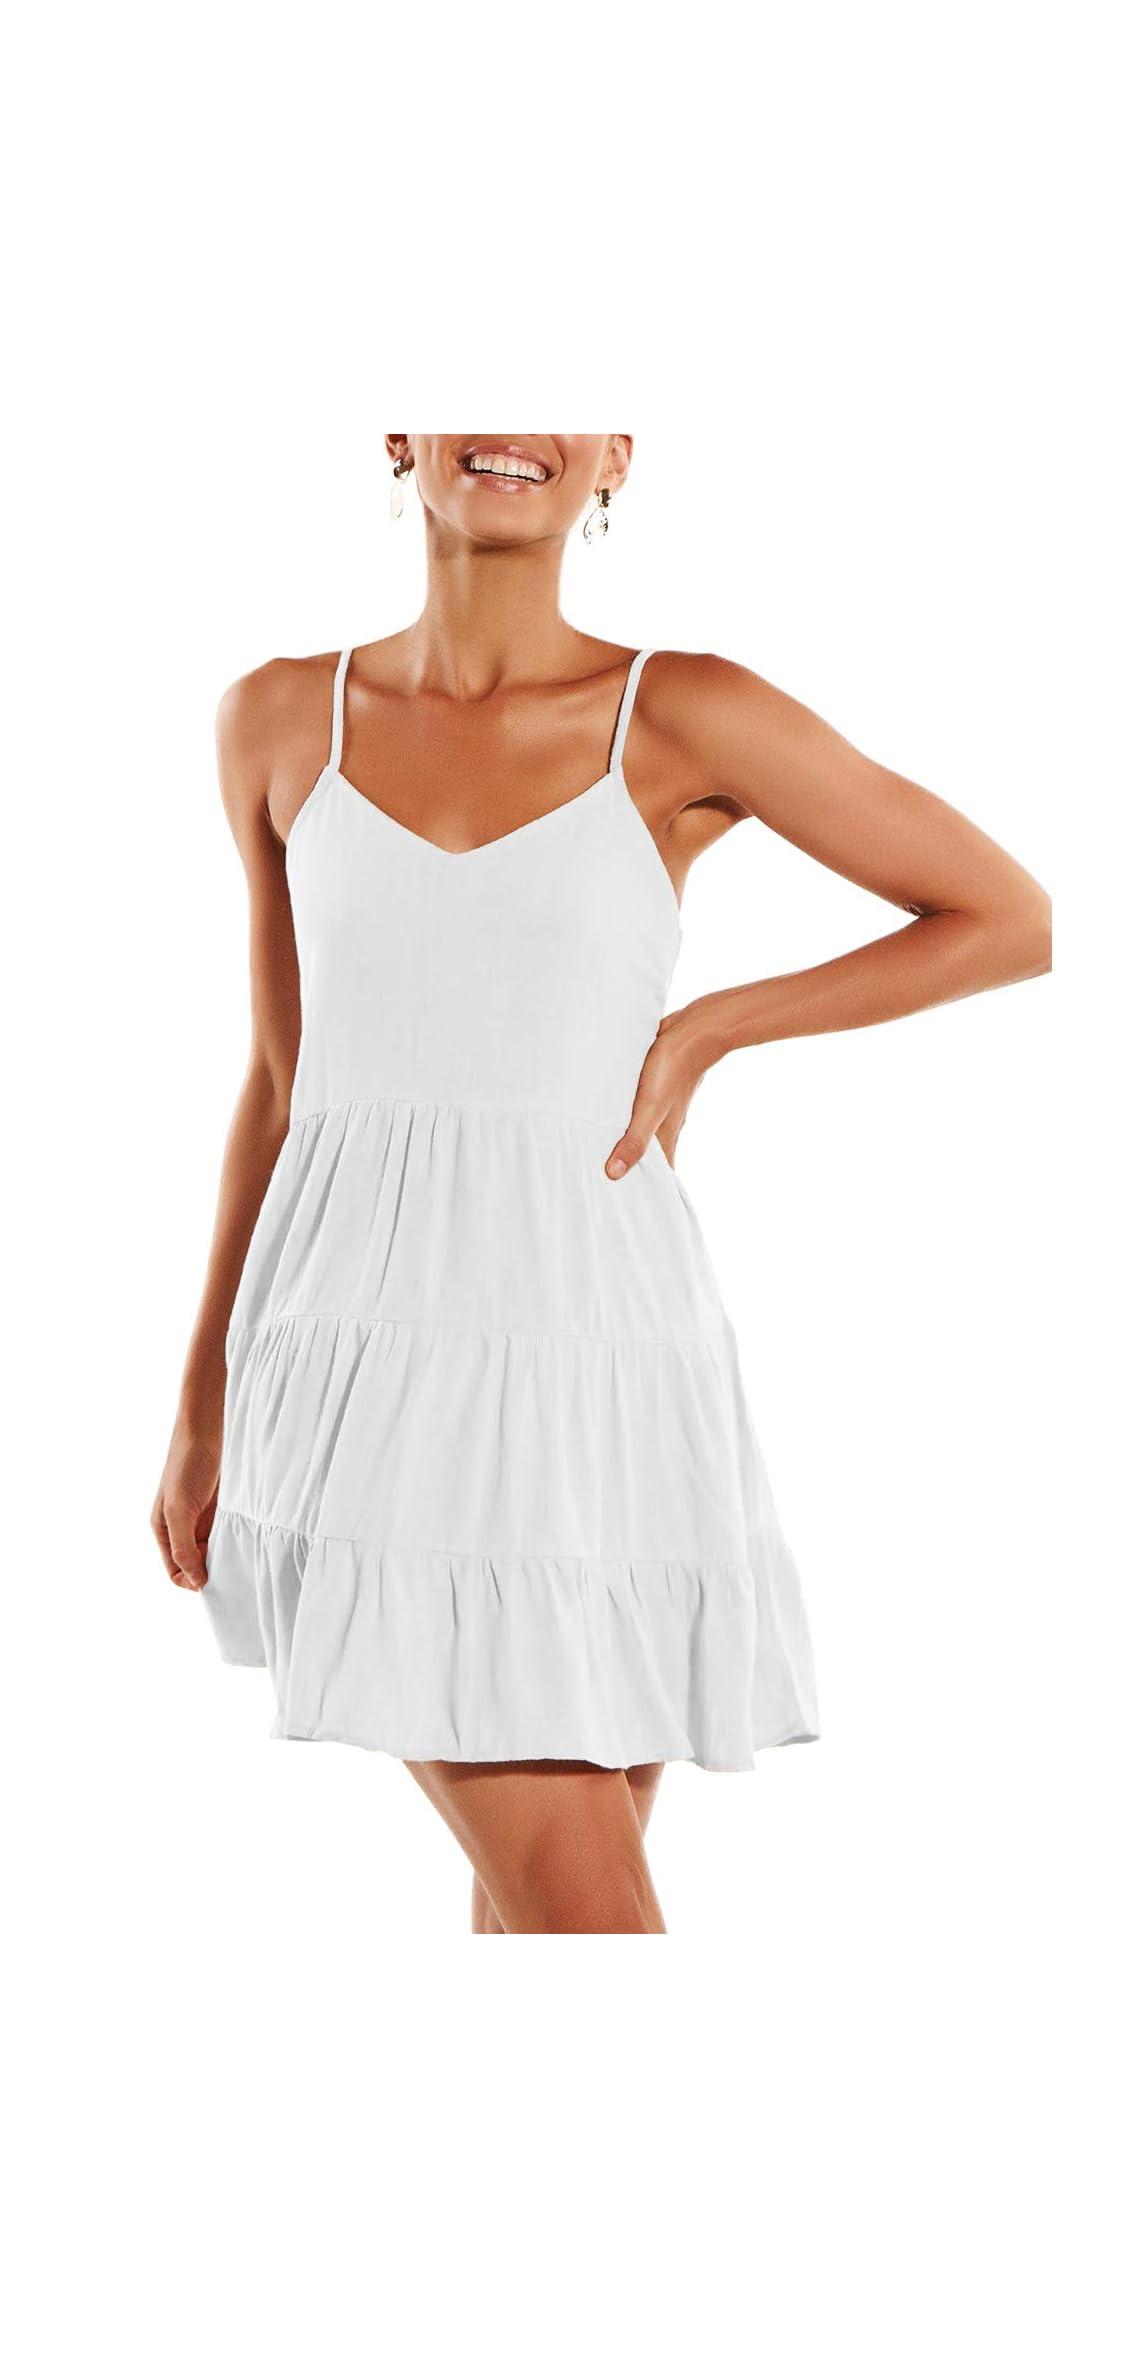 Womens Summer Dresses V Neck Sleeveless Spaghetti Strap T